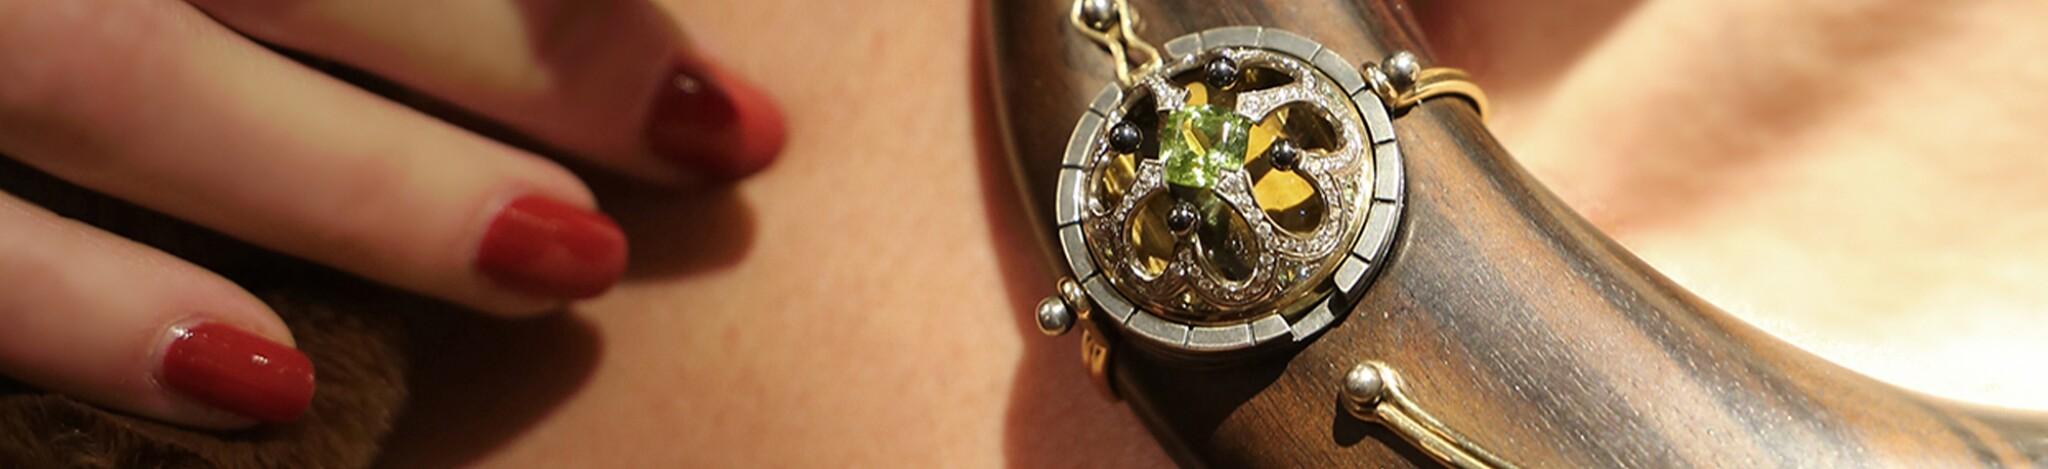 Jewels by Elie Top Online*